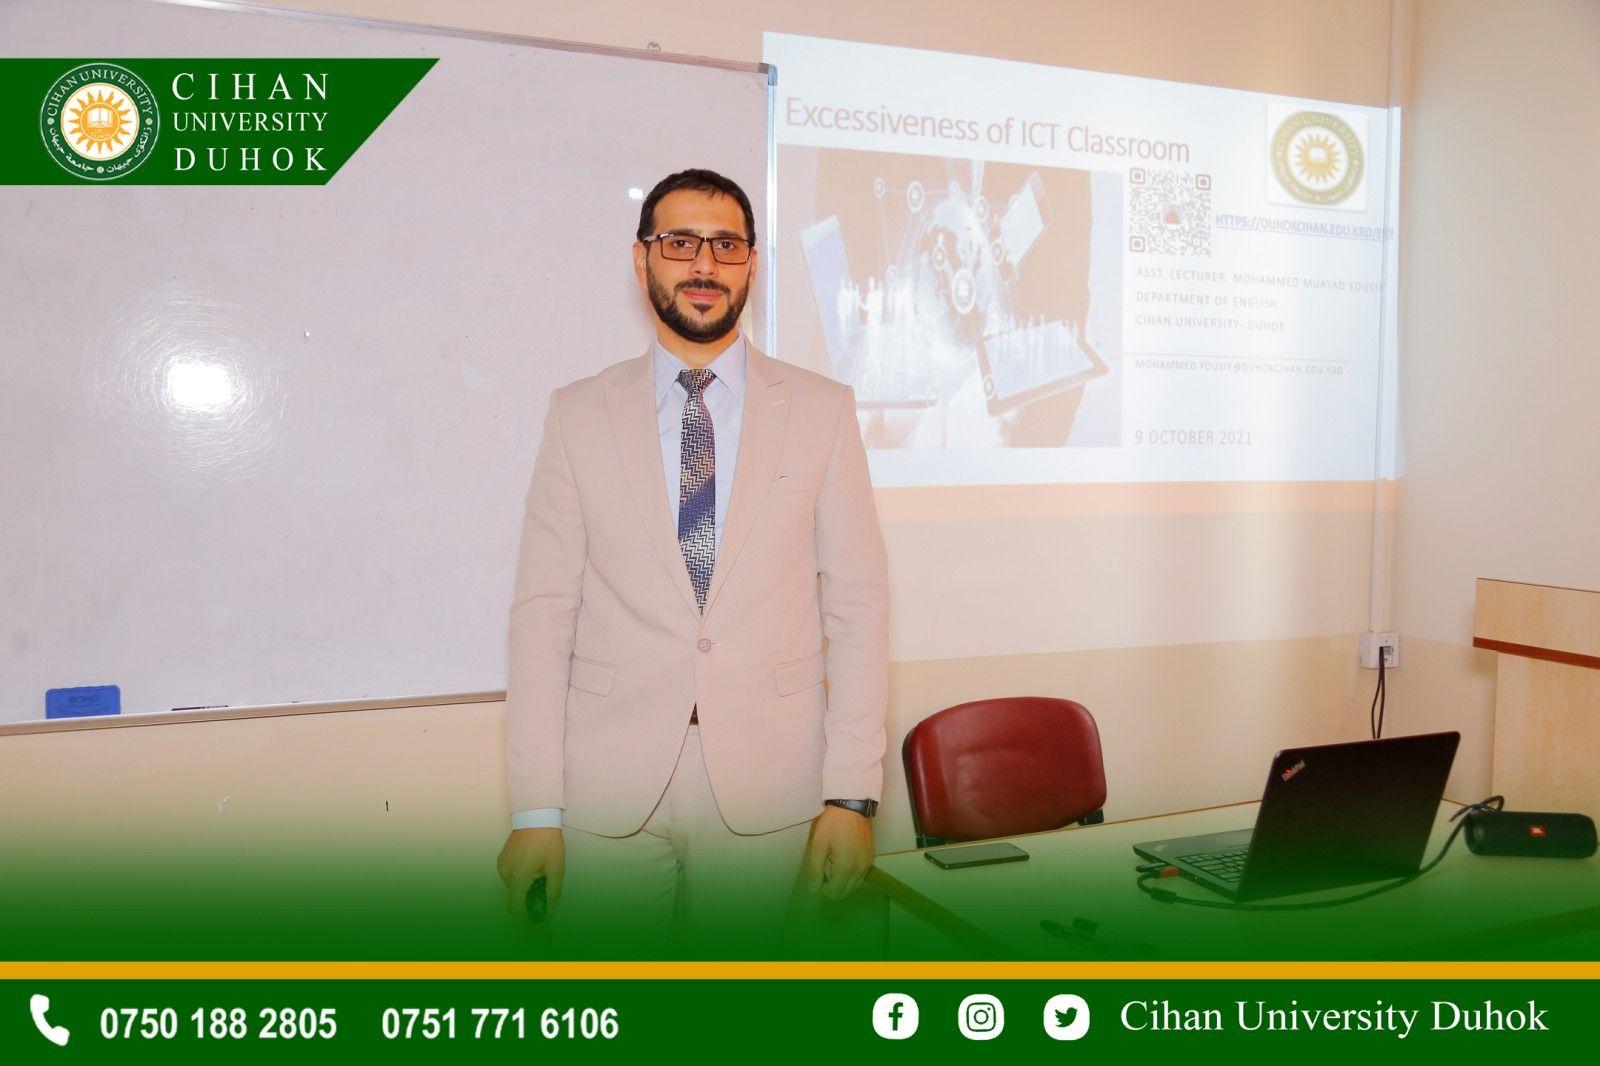 A seminar entitled : Excessiveness of ICT classroom